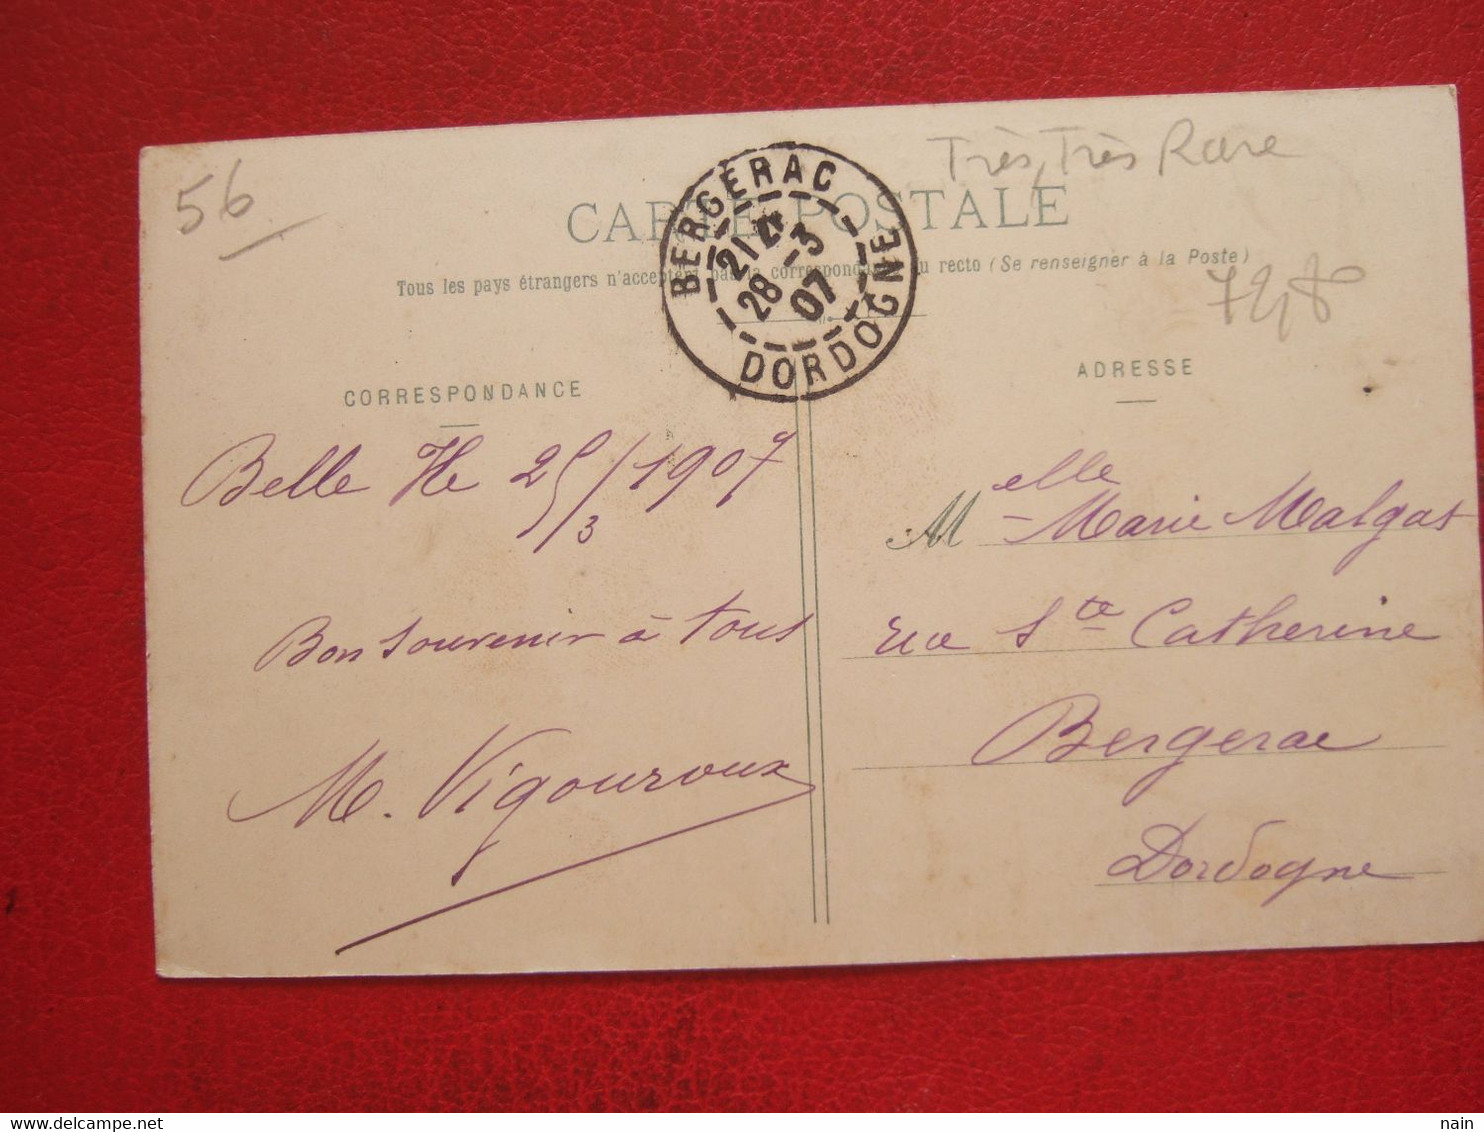 "56 - BELLE ISLE EN MER - ILE EN MER - "" BENEDICTOPN DE L'EGLISE PAR Mgr GOURAUD LE 25 NOV 1906 ""   --"" TRES, TRES RARE "" - Belle Ile En Mer"